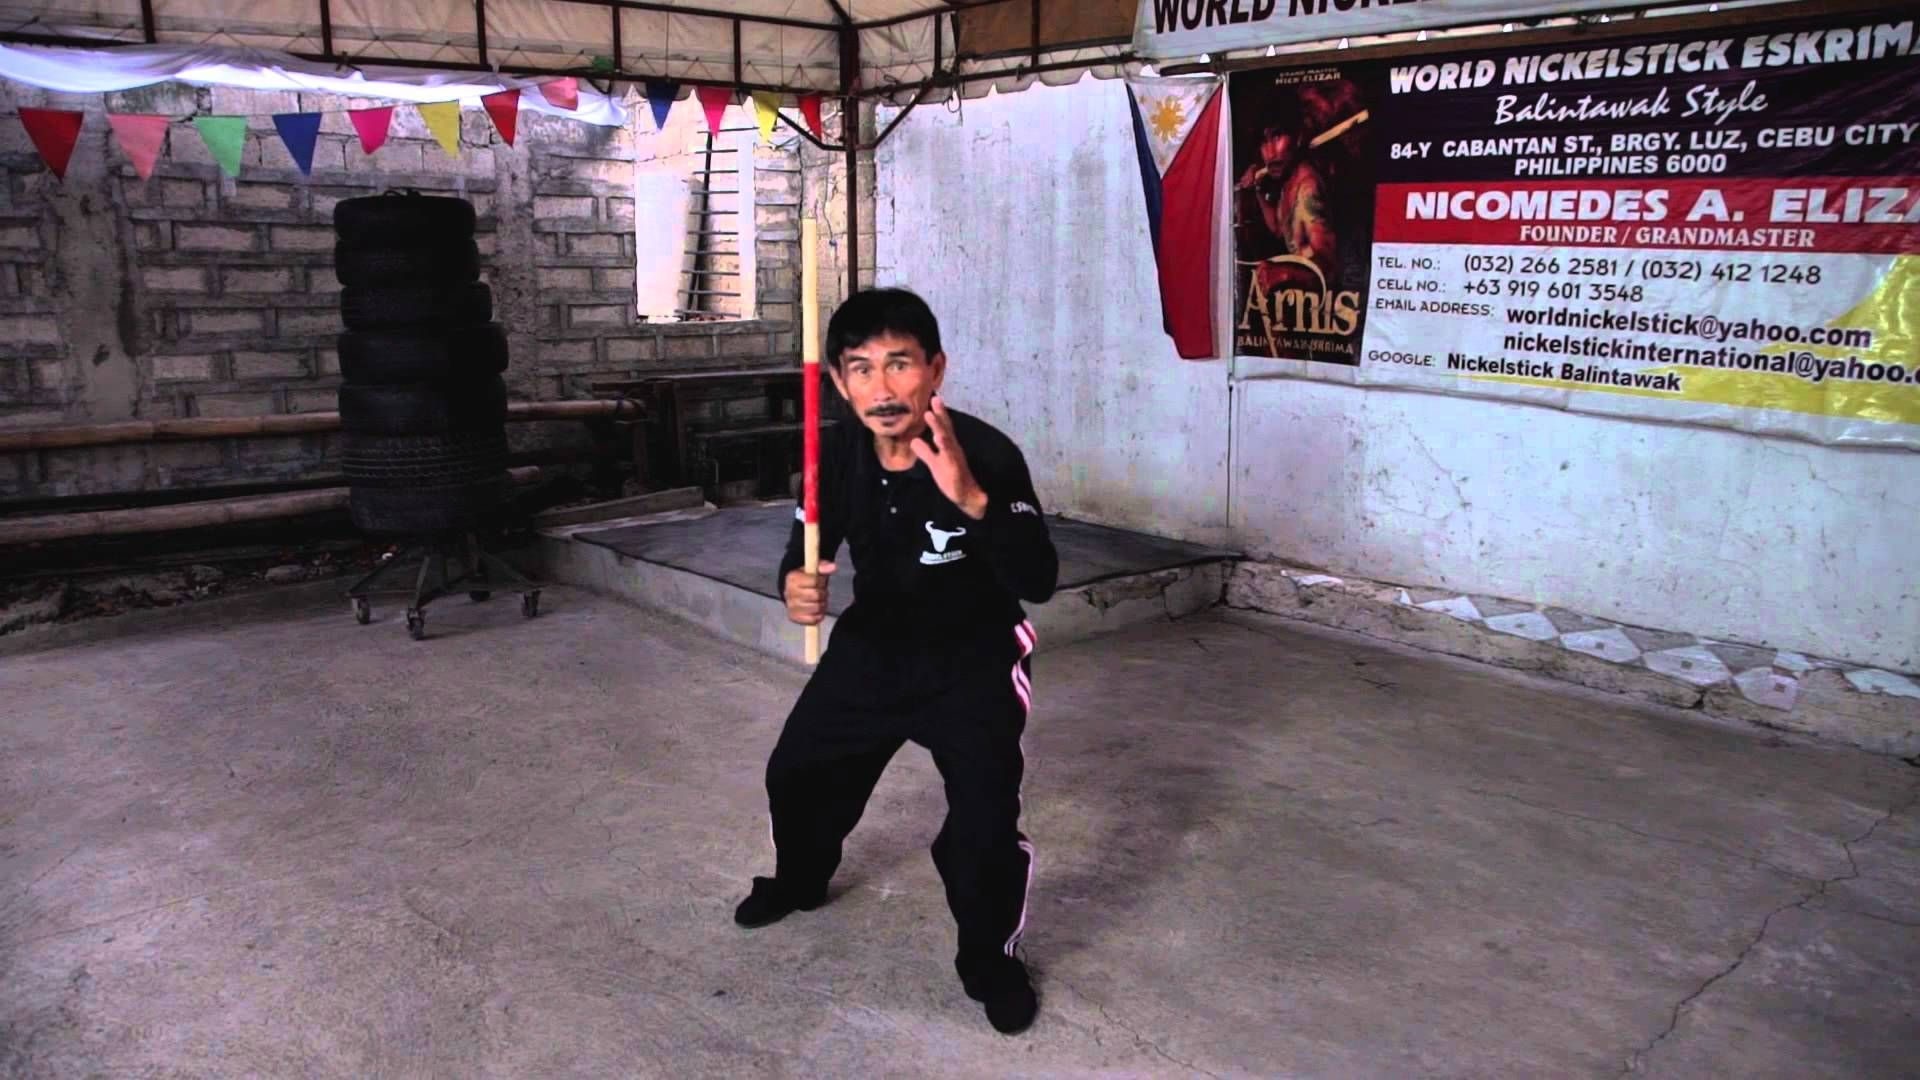 Nickelstick Academy Stance (With images) Balintawak